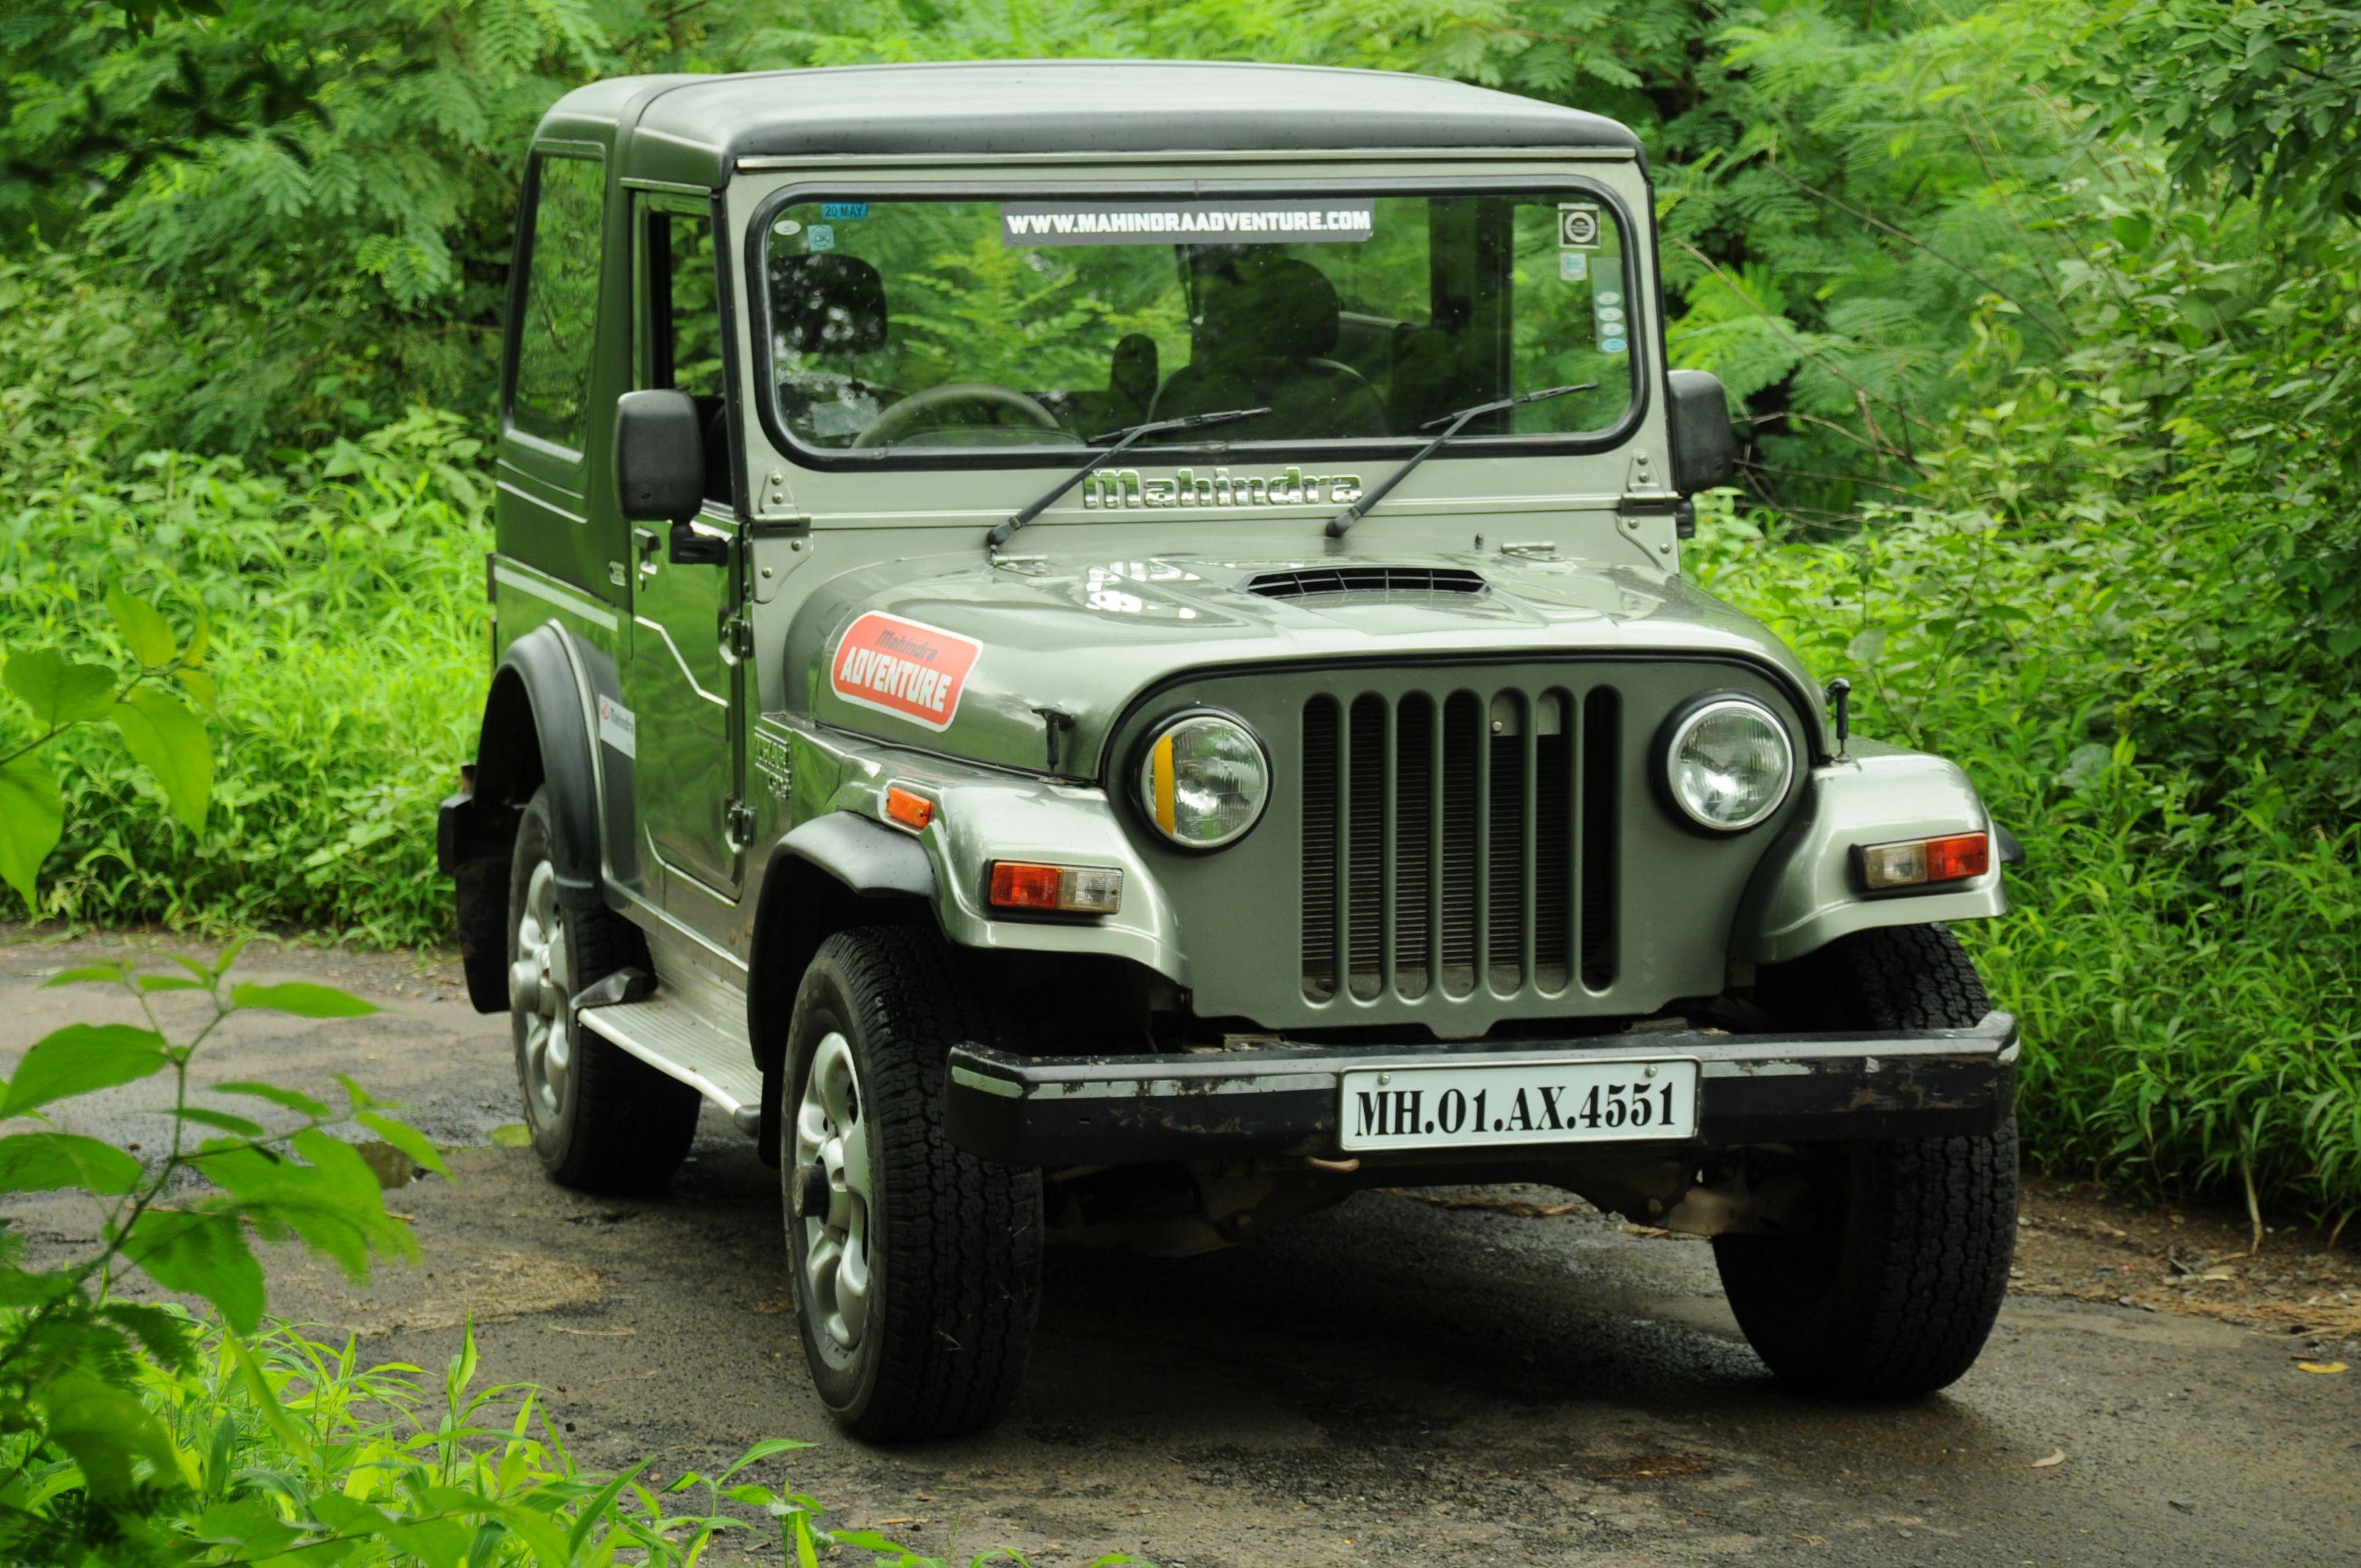 Mahindra Thar Hard Top Mahindra Thar Mahindra 4x4 Jeep